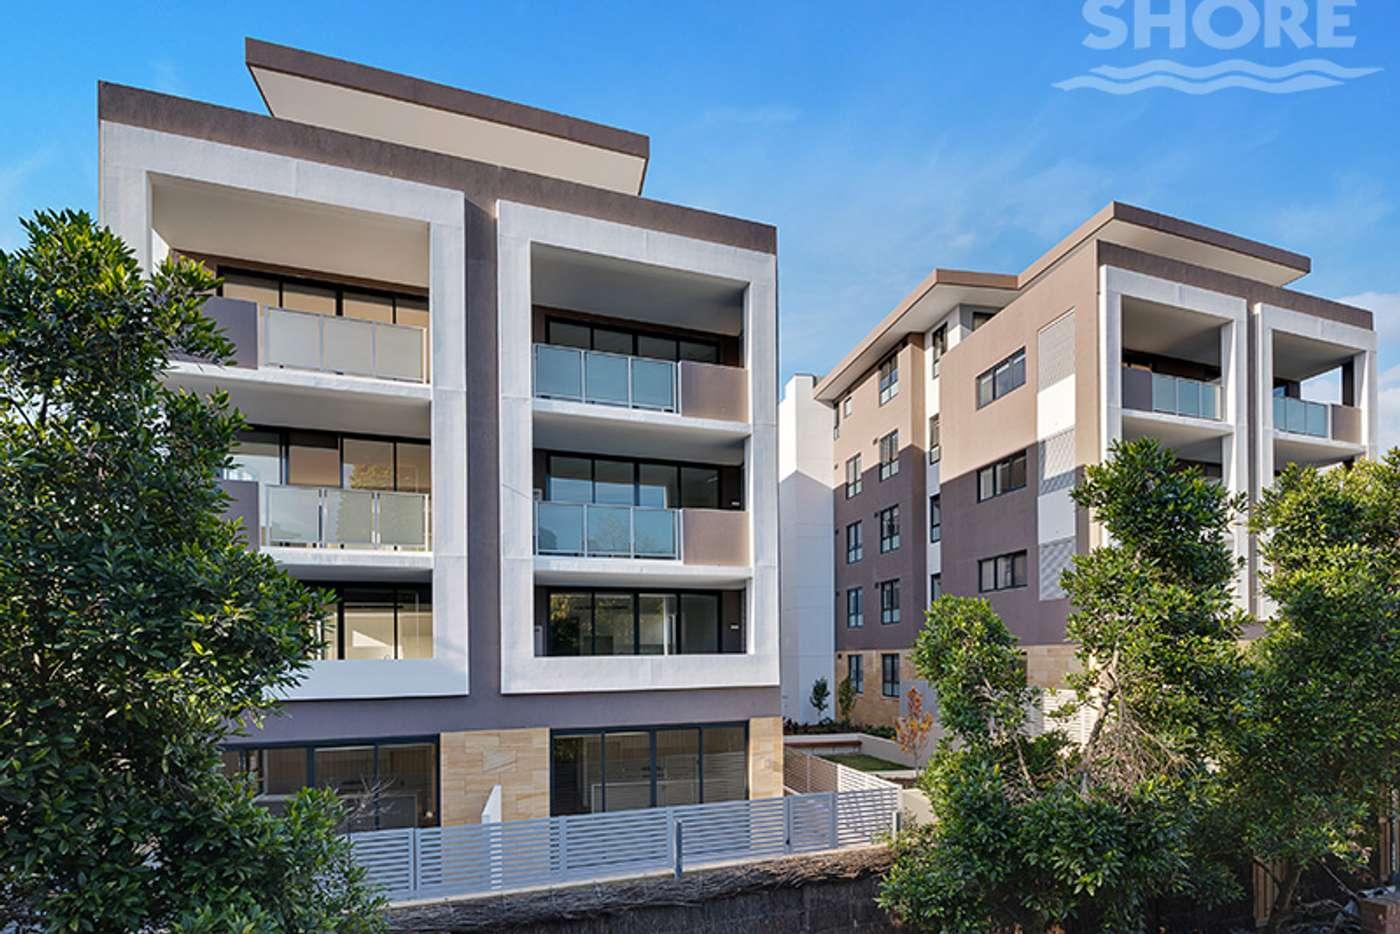 Main view of Homely apartment listing, 101/4 Culworth Avenue, Killara NSW 2071